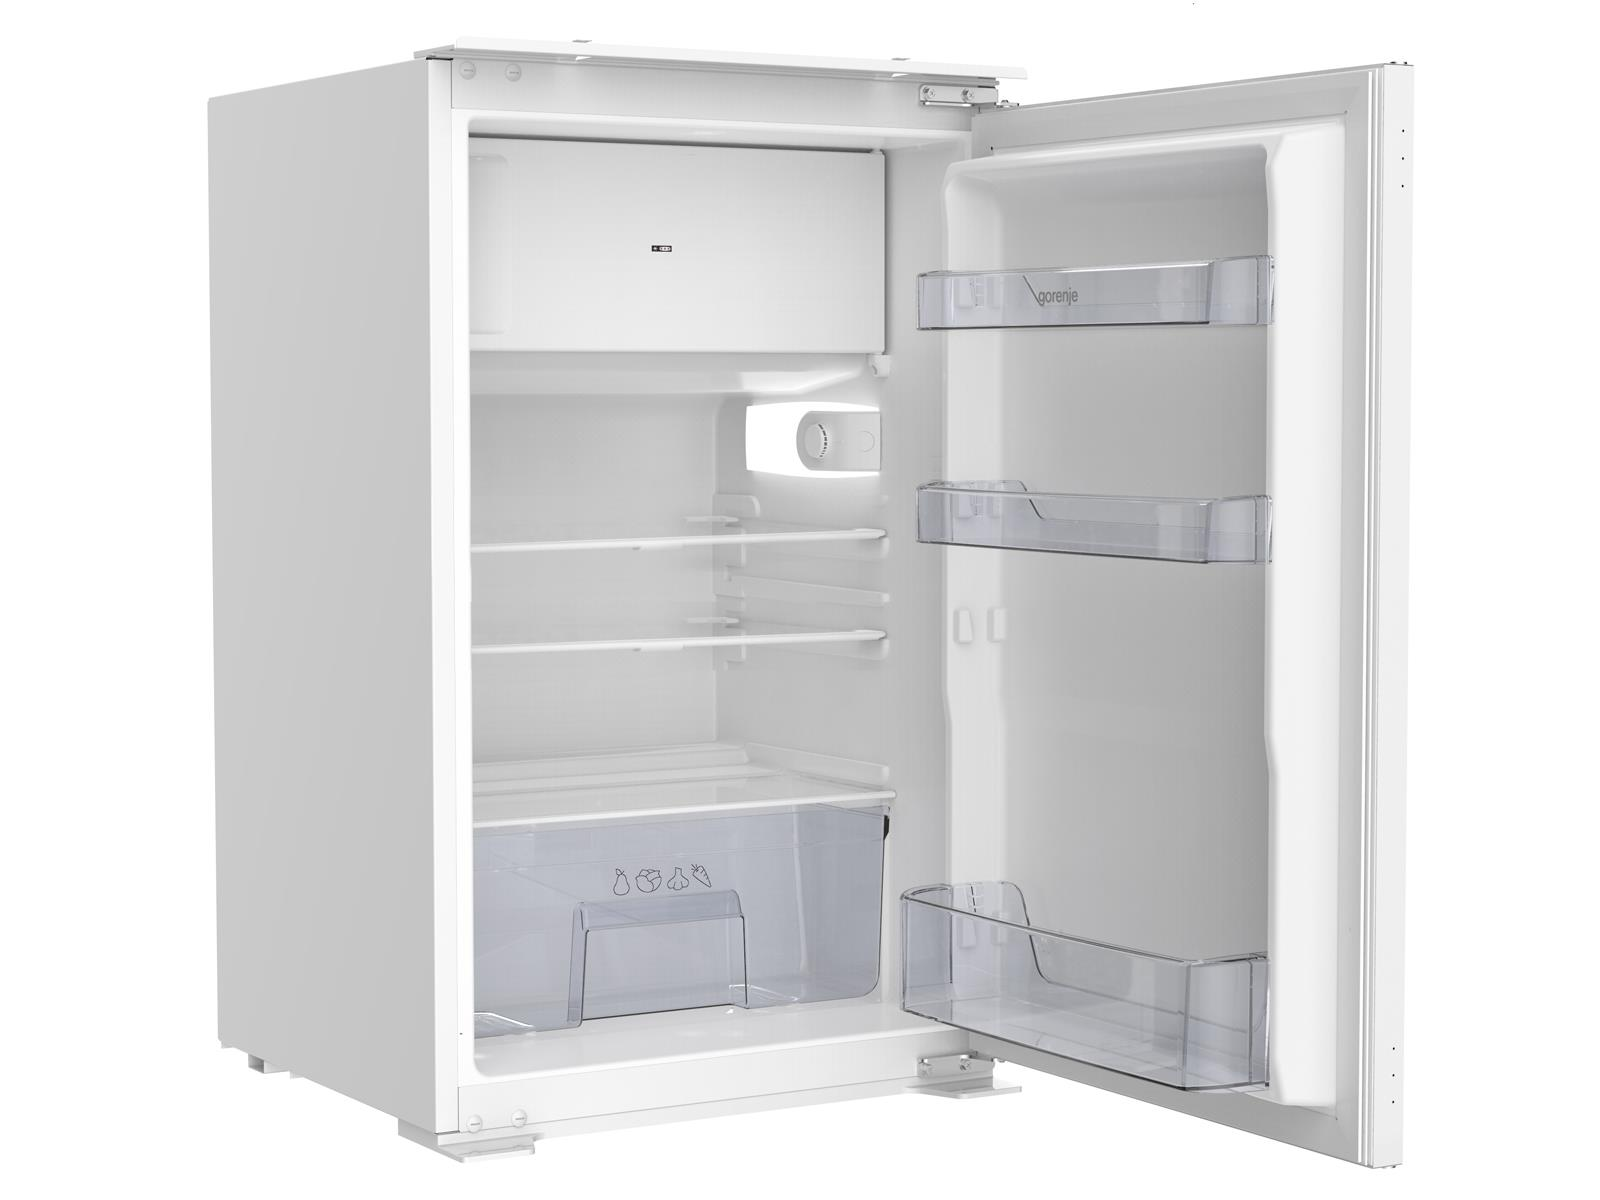 Gorenje RBI 4092 P1 Einbau-Kühlschrank Weiß